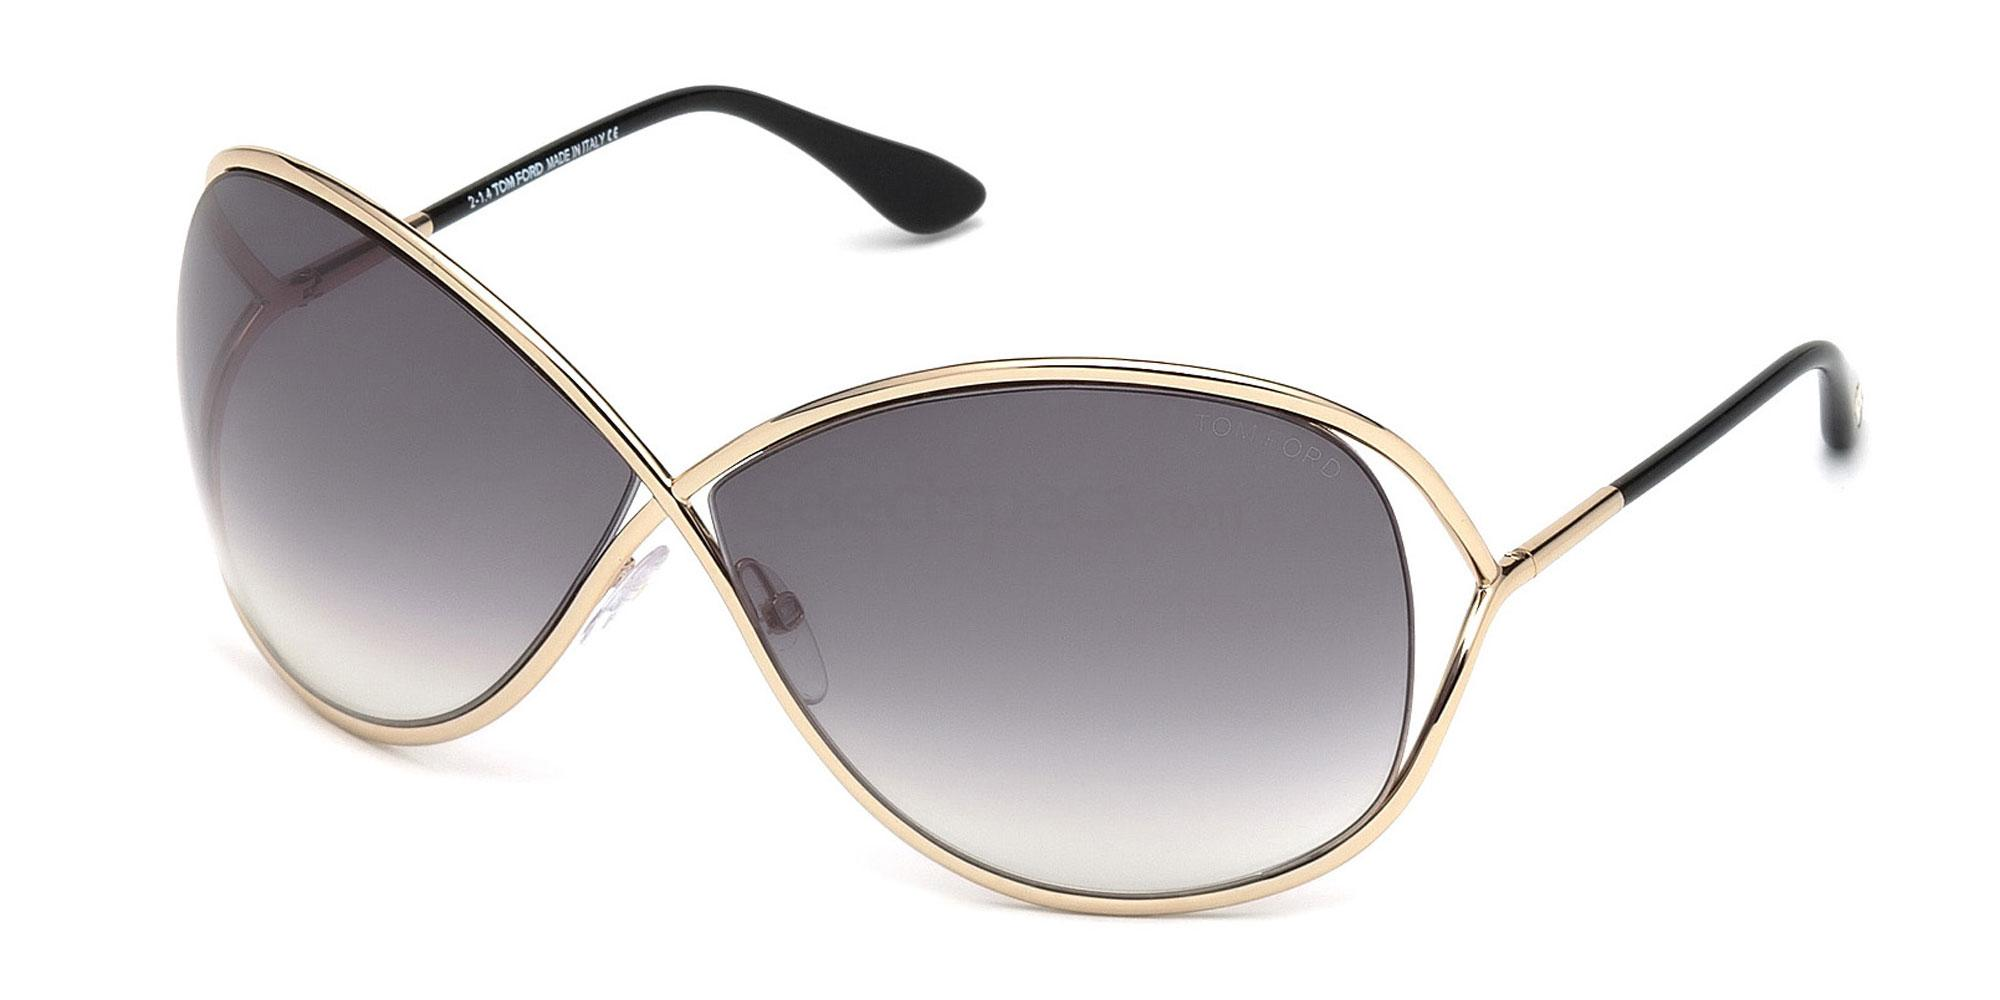 28B FT0130 Miranda Sunglasses, Tom Ford